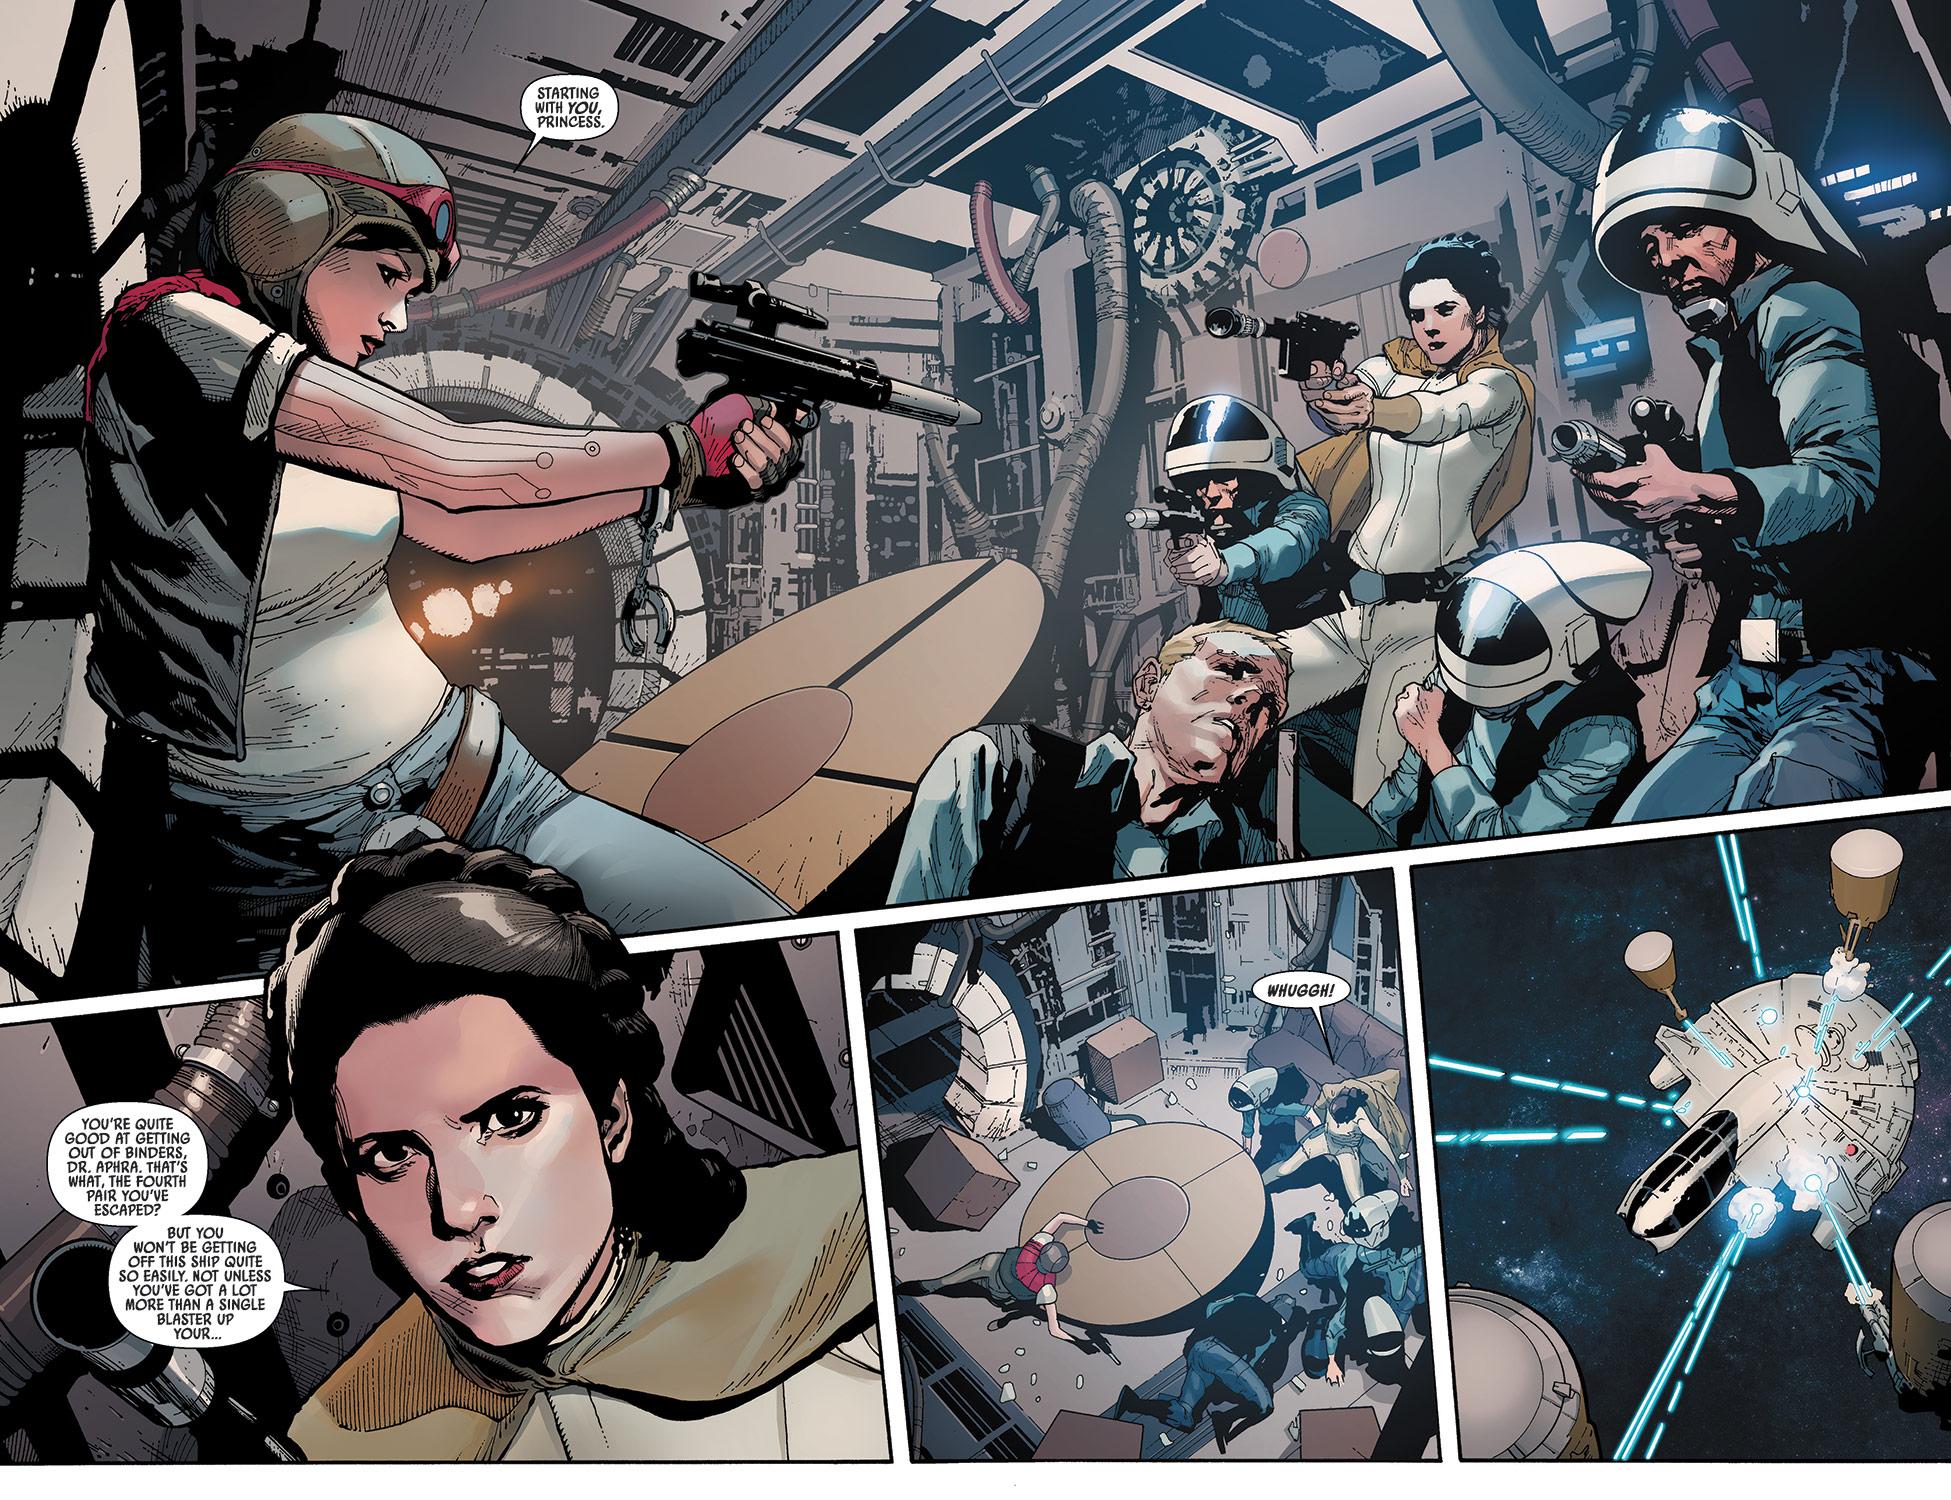 Star Wars Rebel Jail review